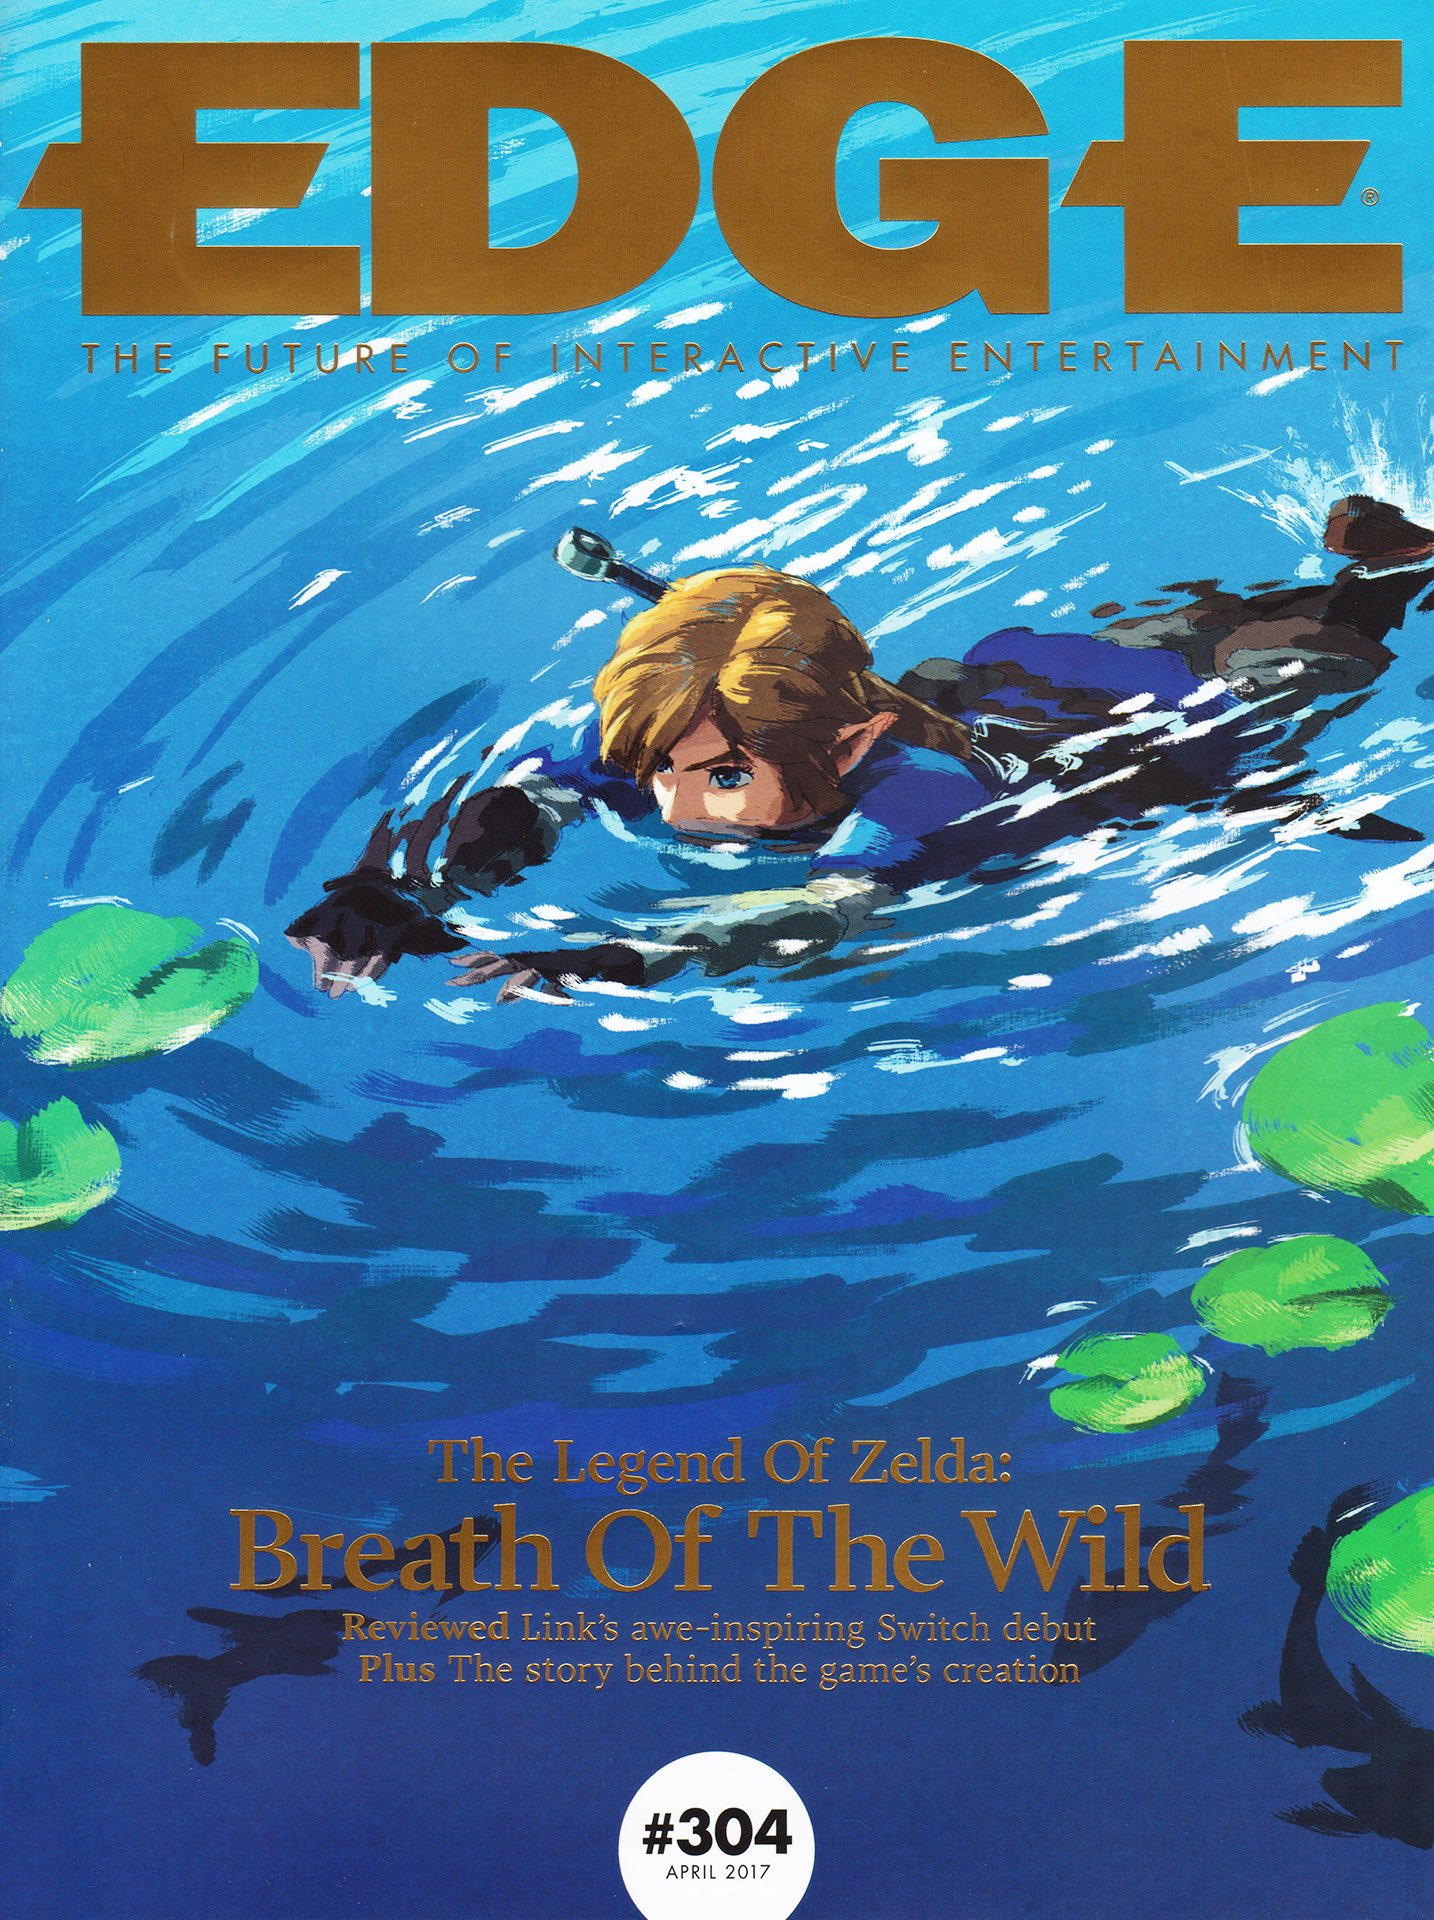 Edge 304 (April 2017) (subscriber edition)